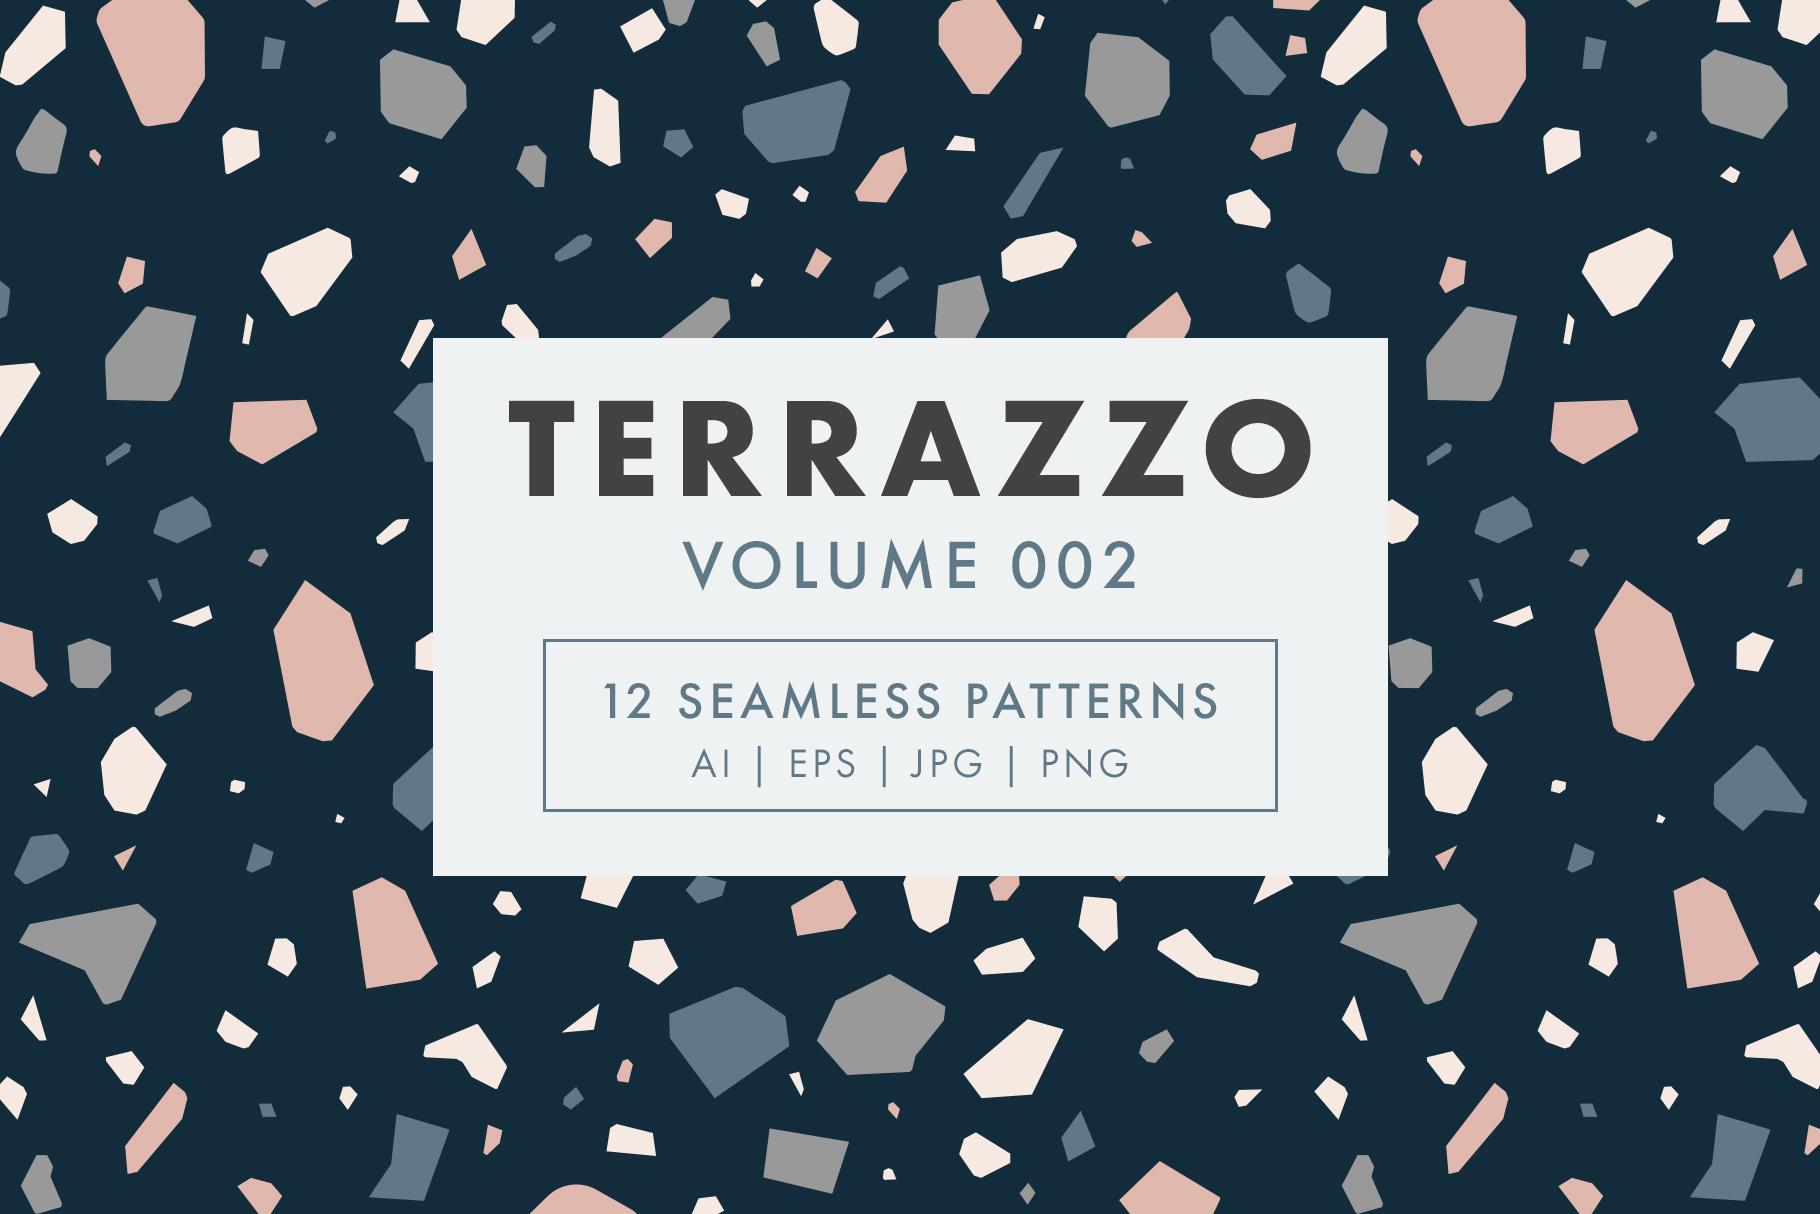 Terrazzo Seamless Patterns Vol. 002 example image 1